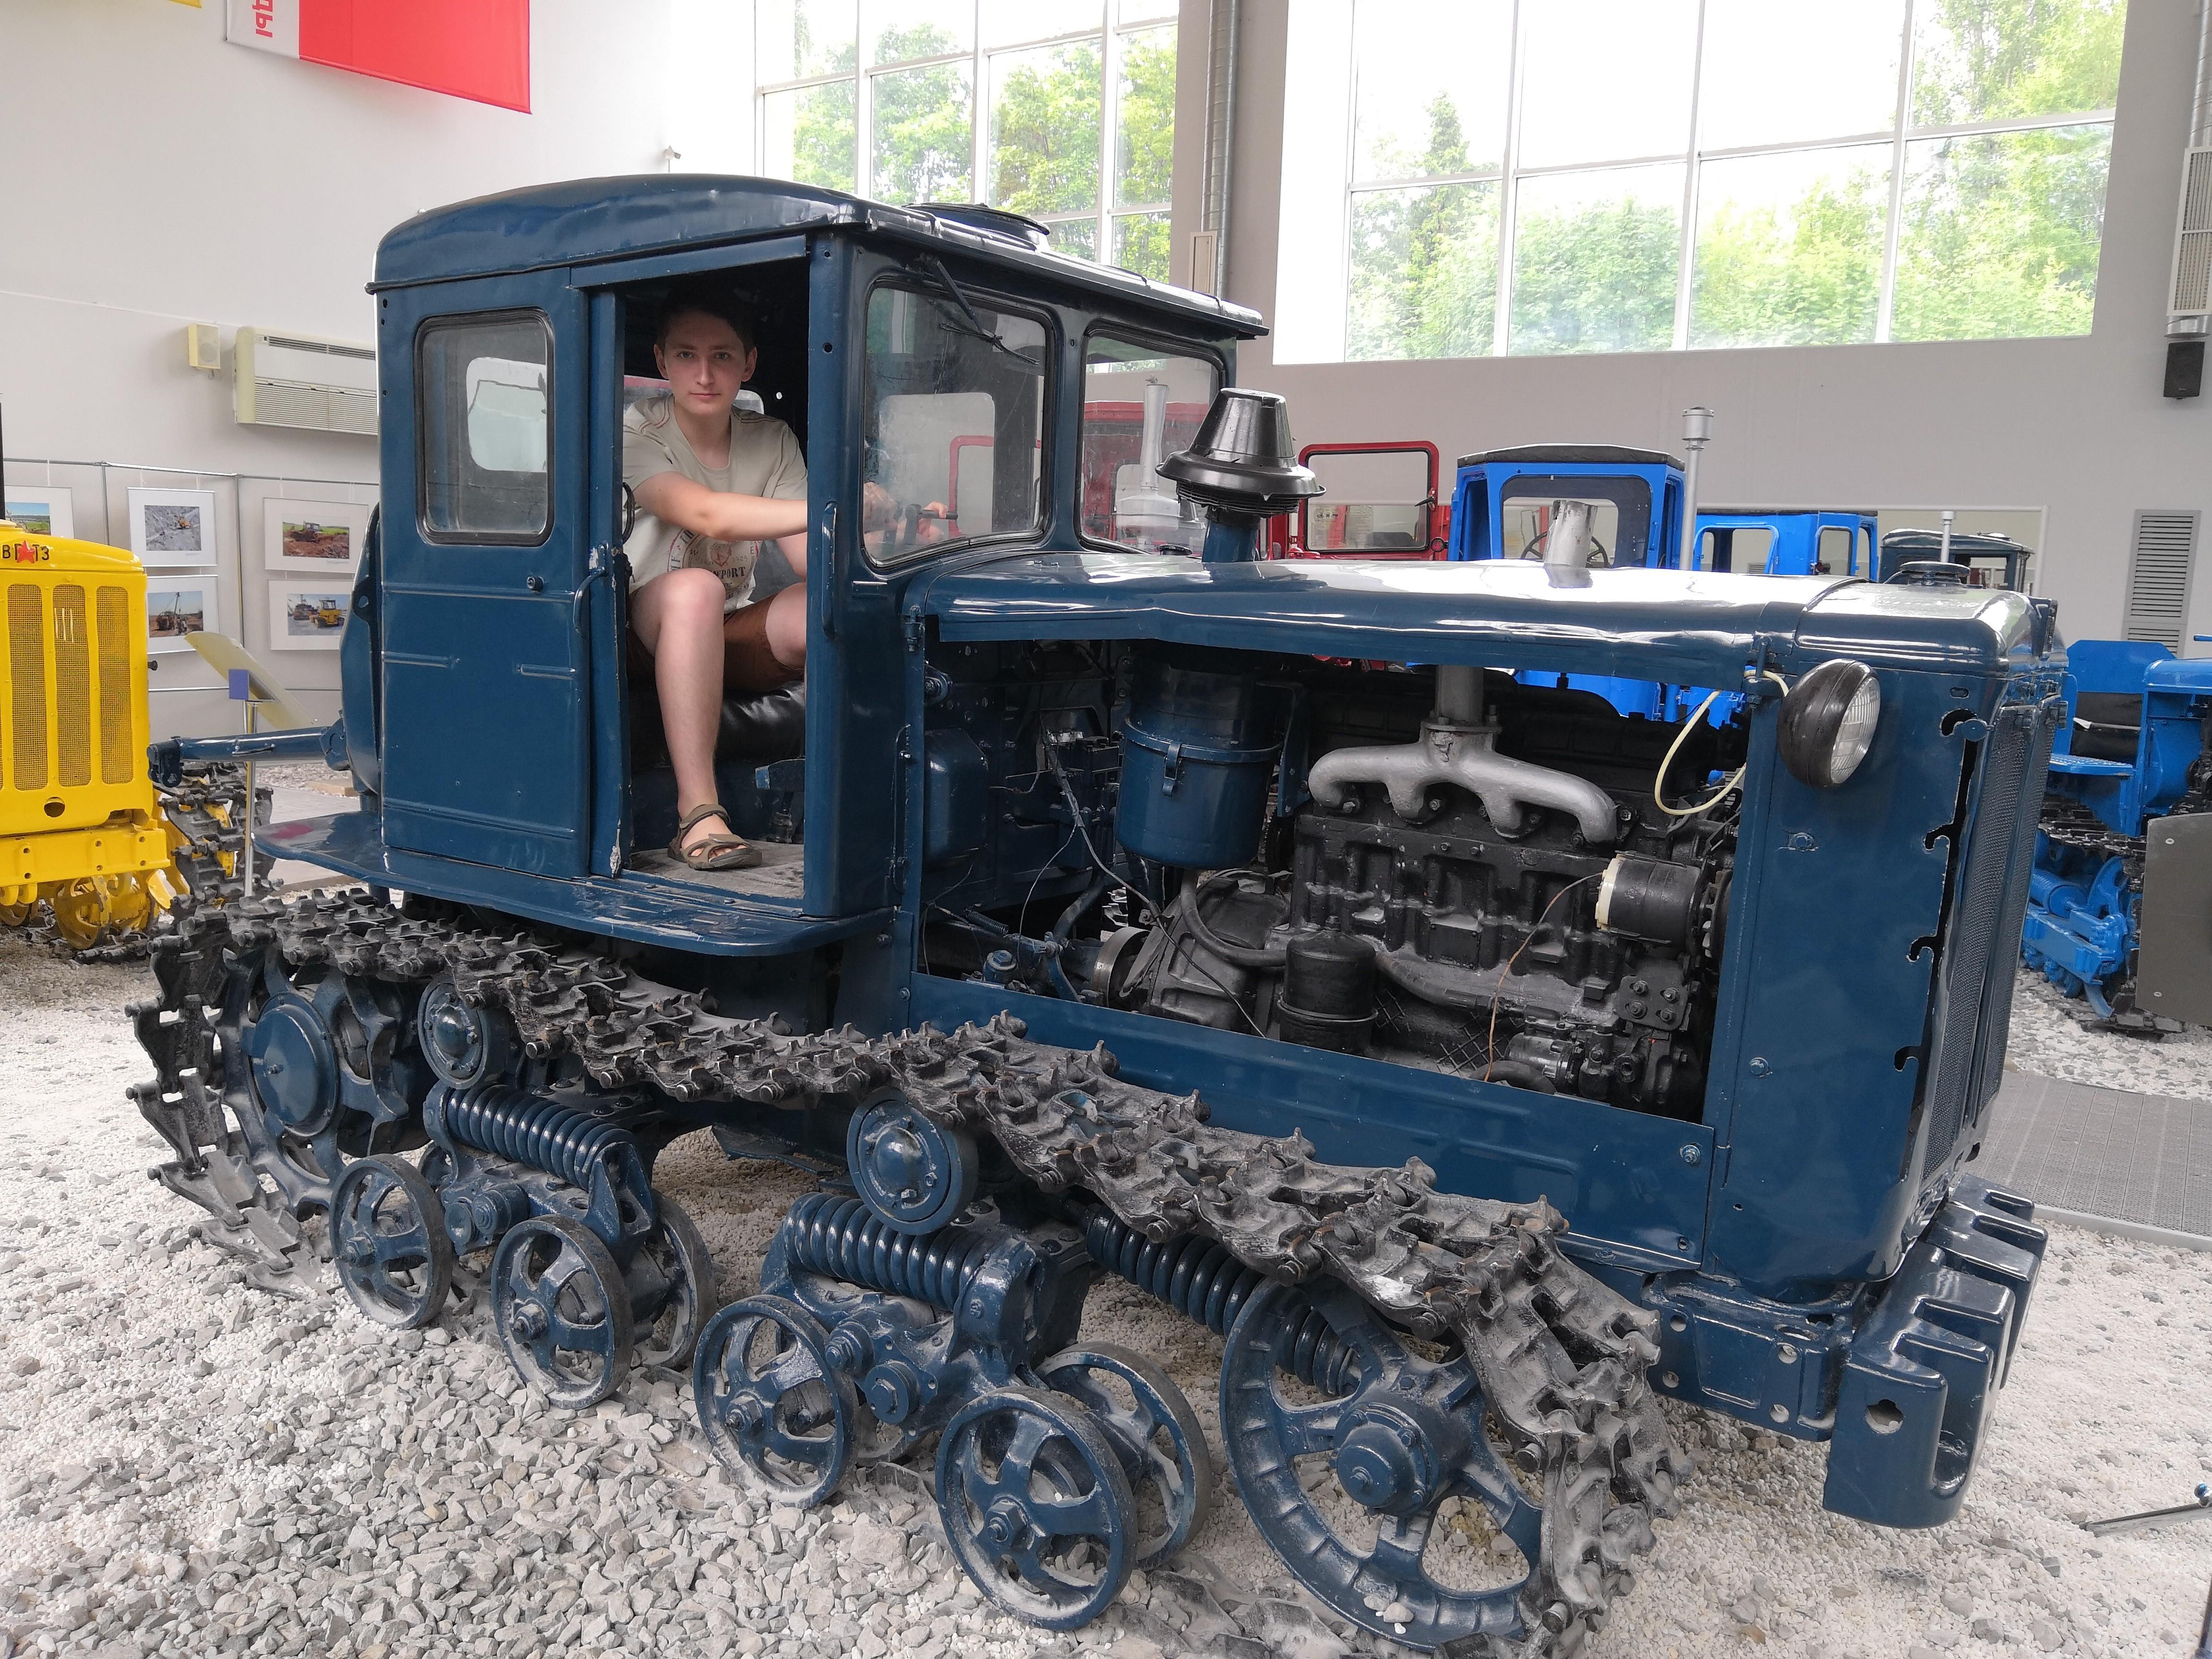 Музей истории трактора в Чебоксарах. 408335.jpeg